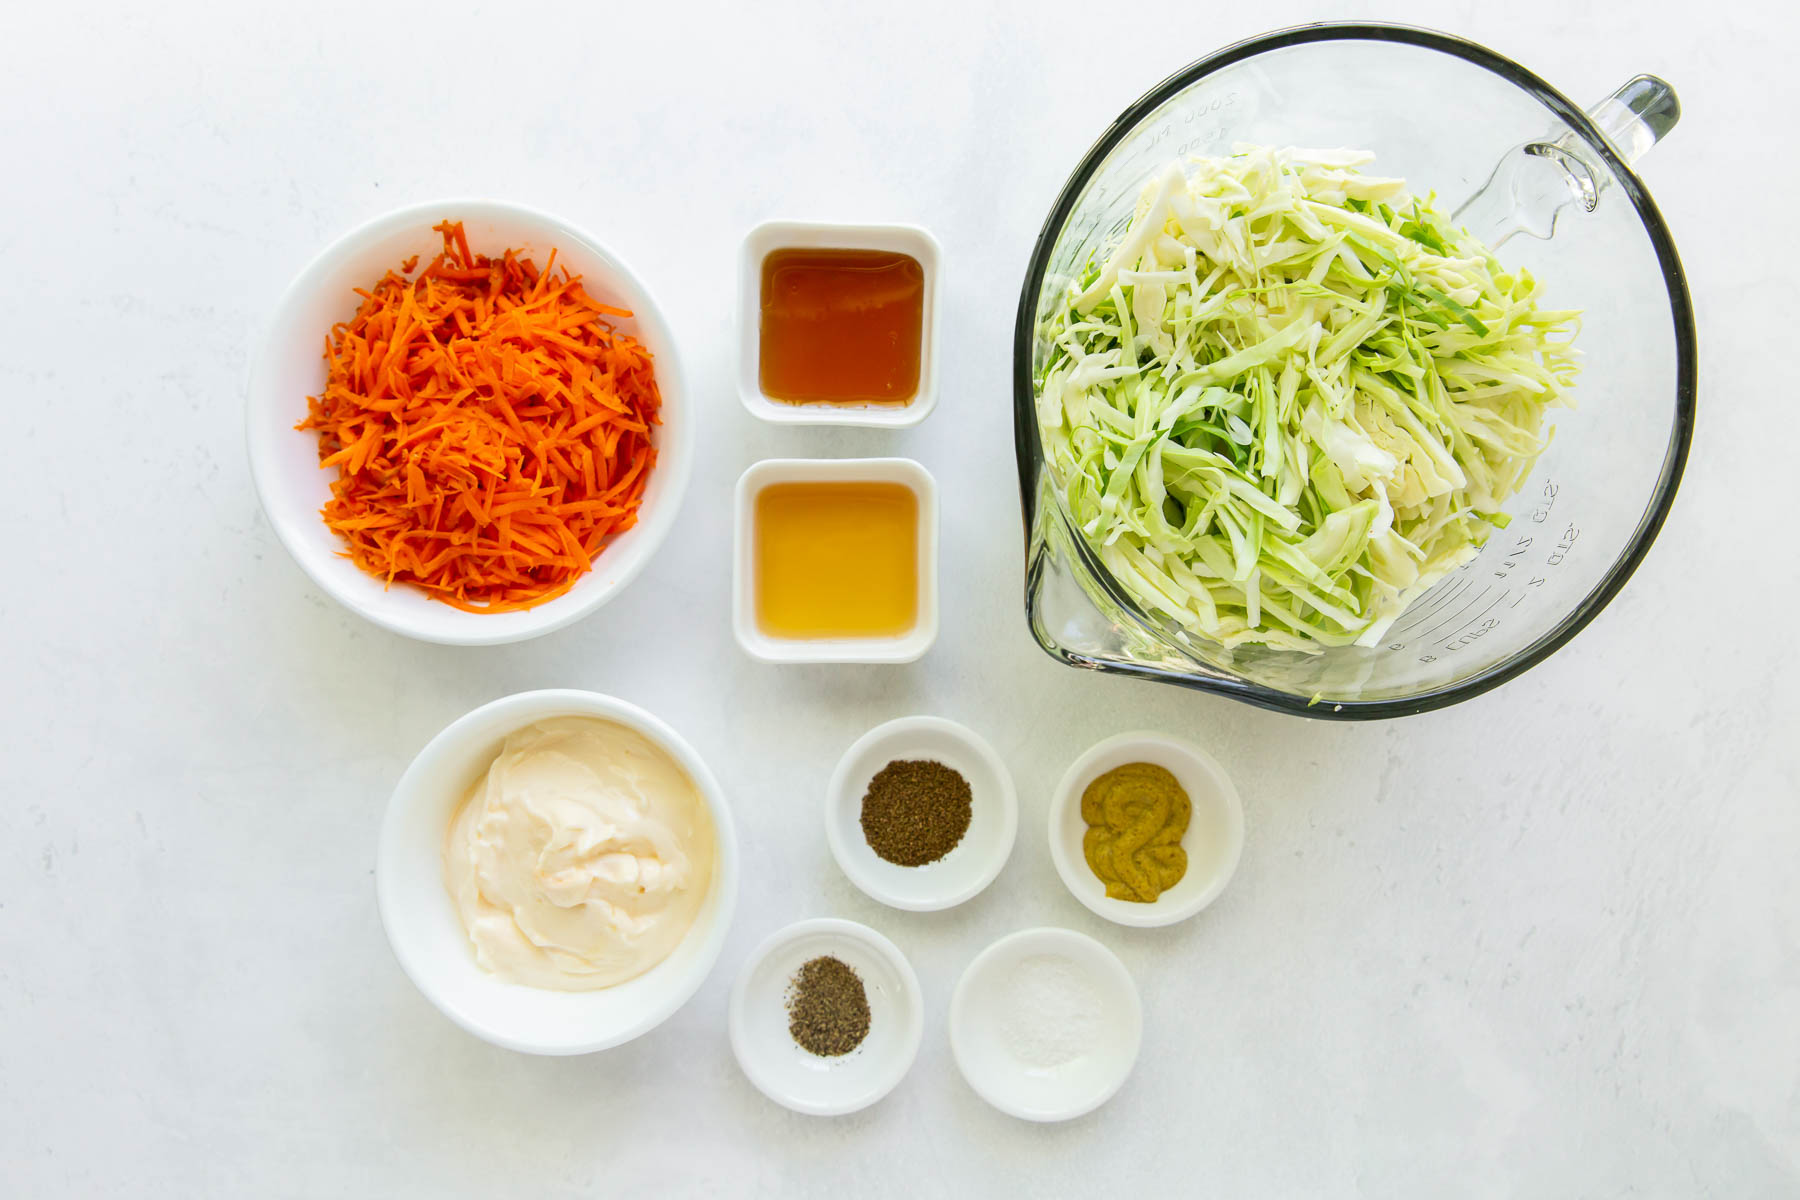 ingredients for coleslaw recipe